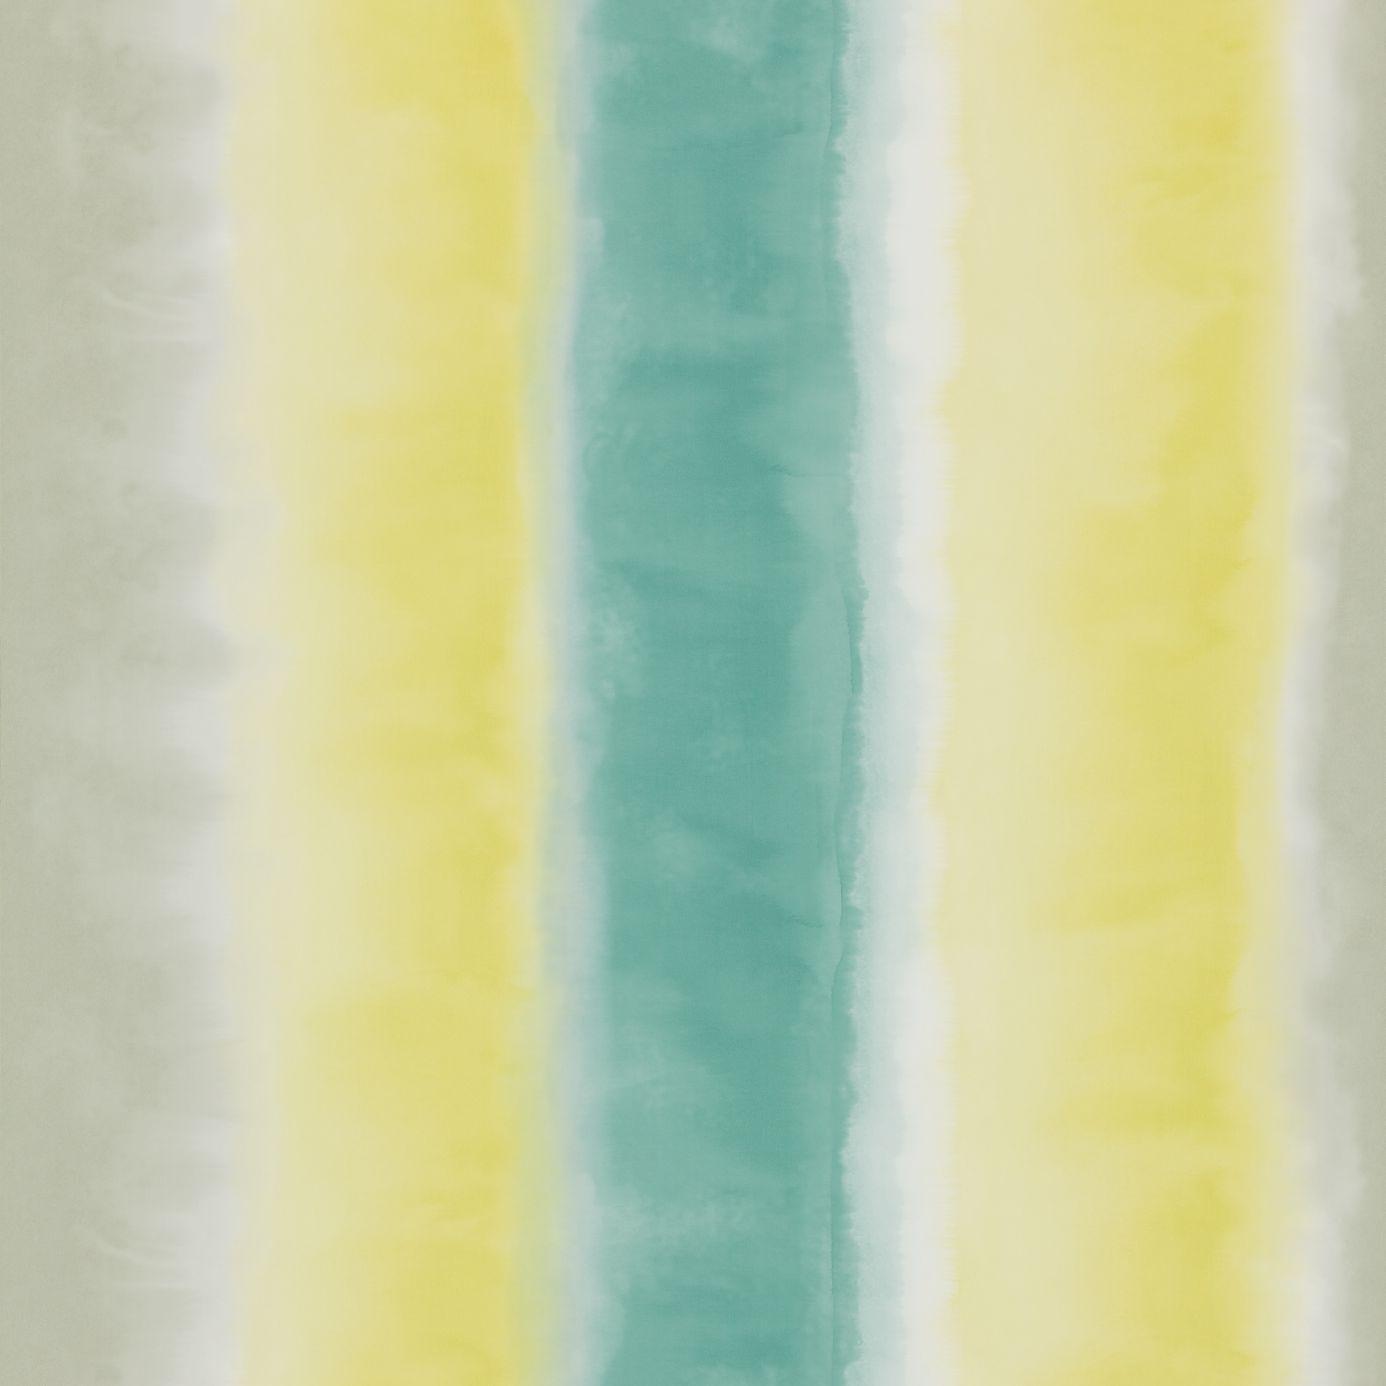 teal design wallpaper - photo #42